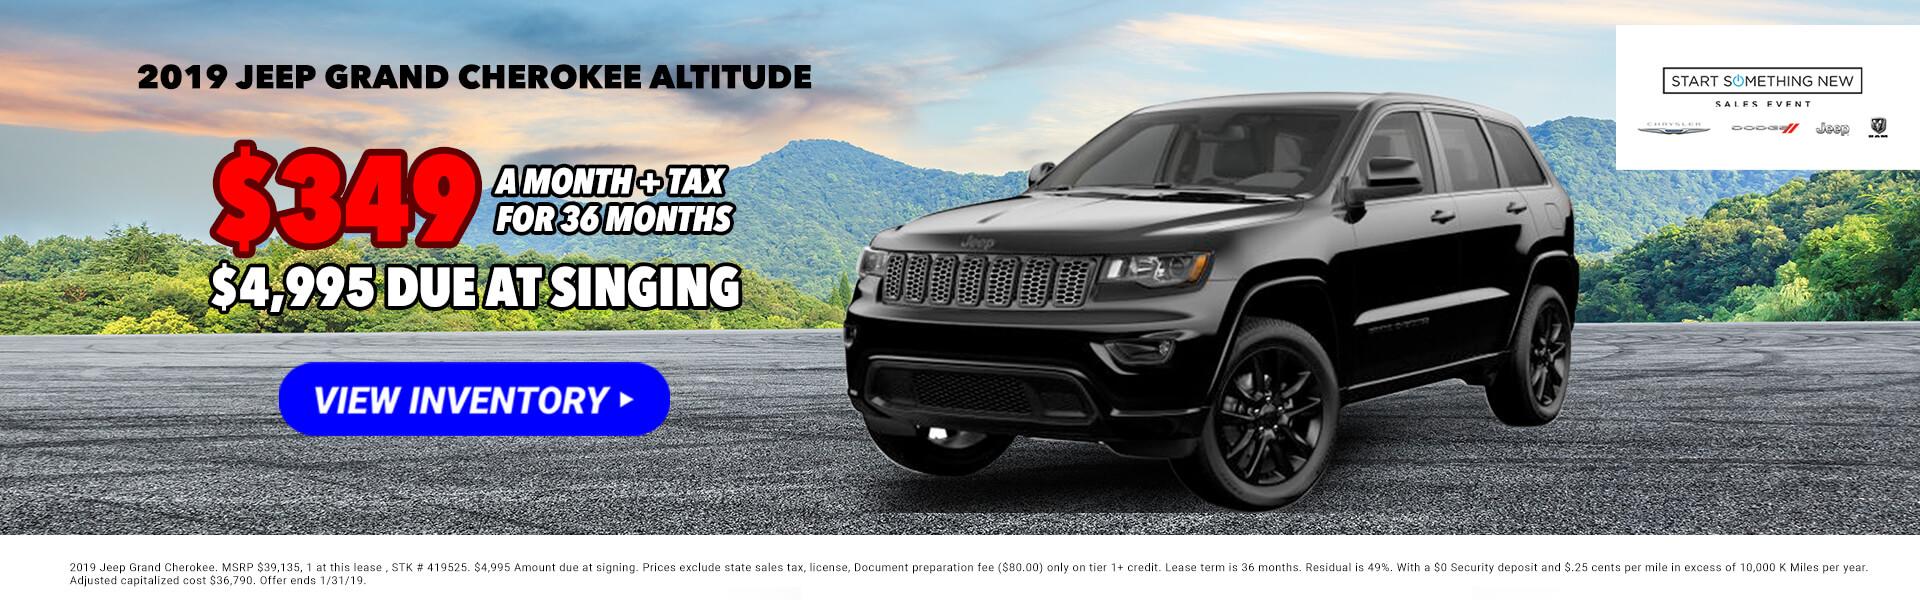 2019 Jeep Grand Cherokee 419525